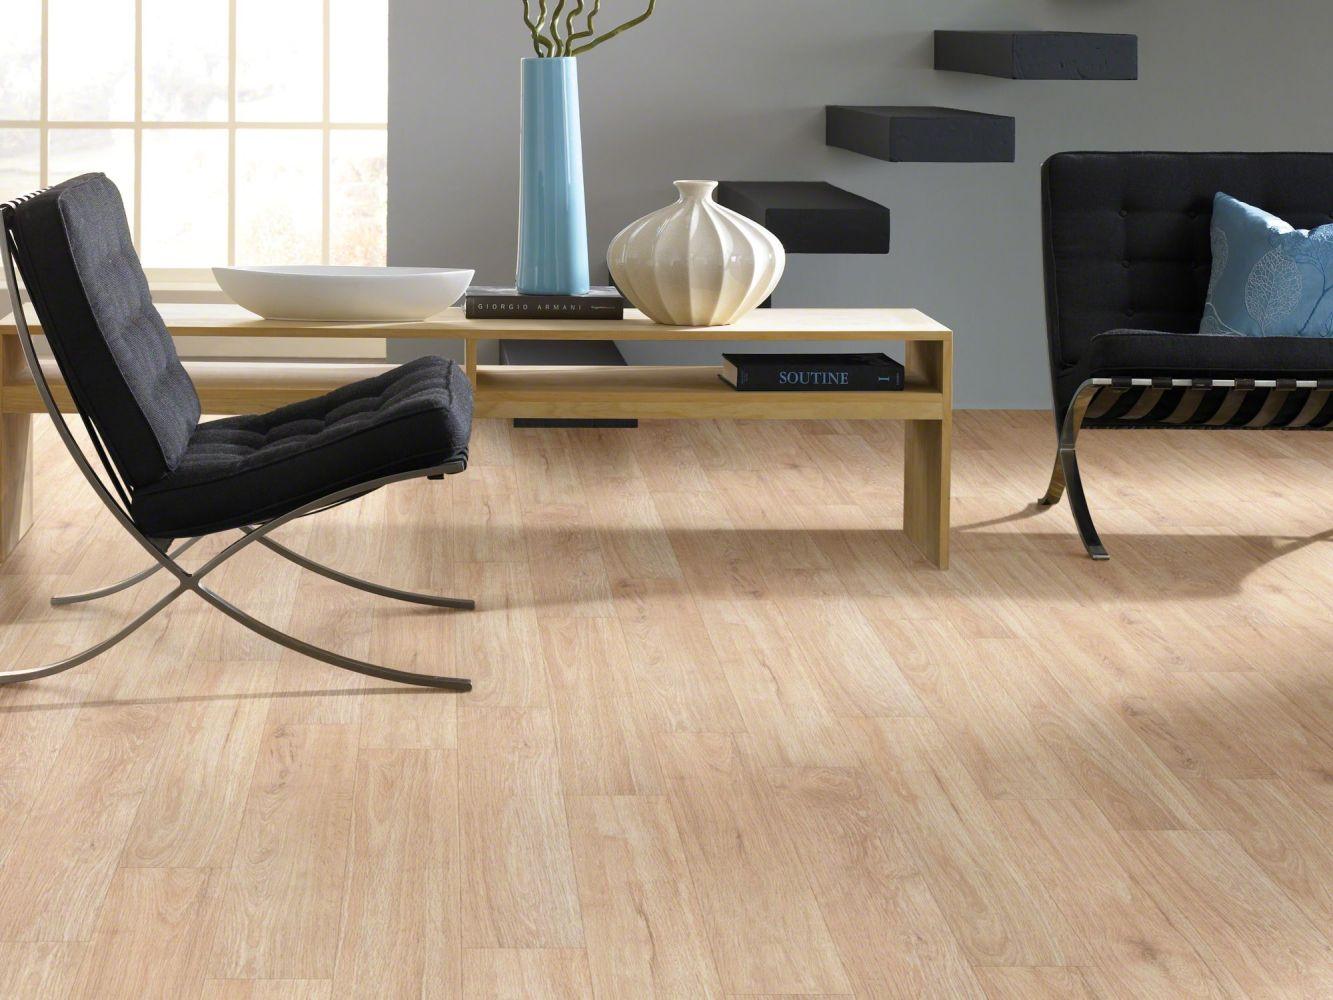 Shaw Floors Resilient Residential Urbanality 20 P Sidewalk 00126_0330V